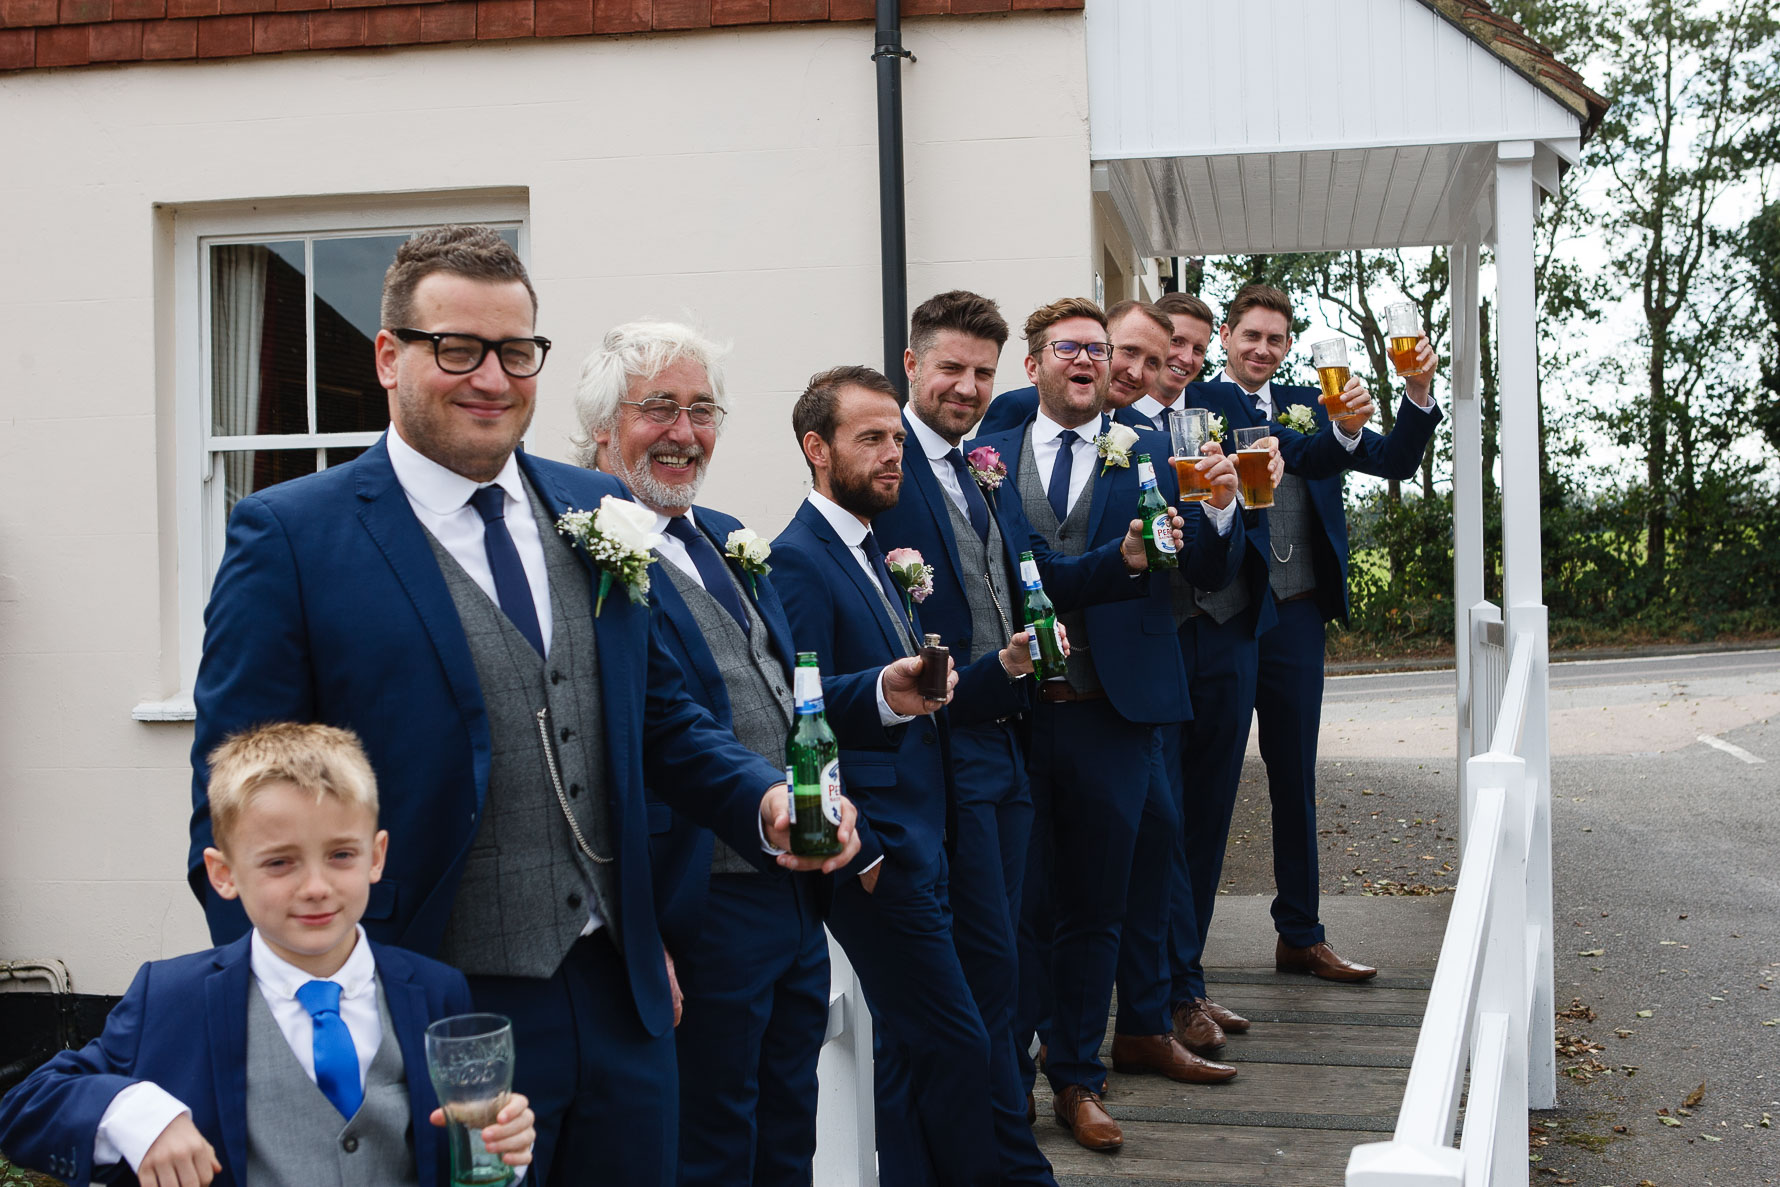 Canterbury Cathedral Lodge Wedding12-20141004 0219